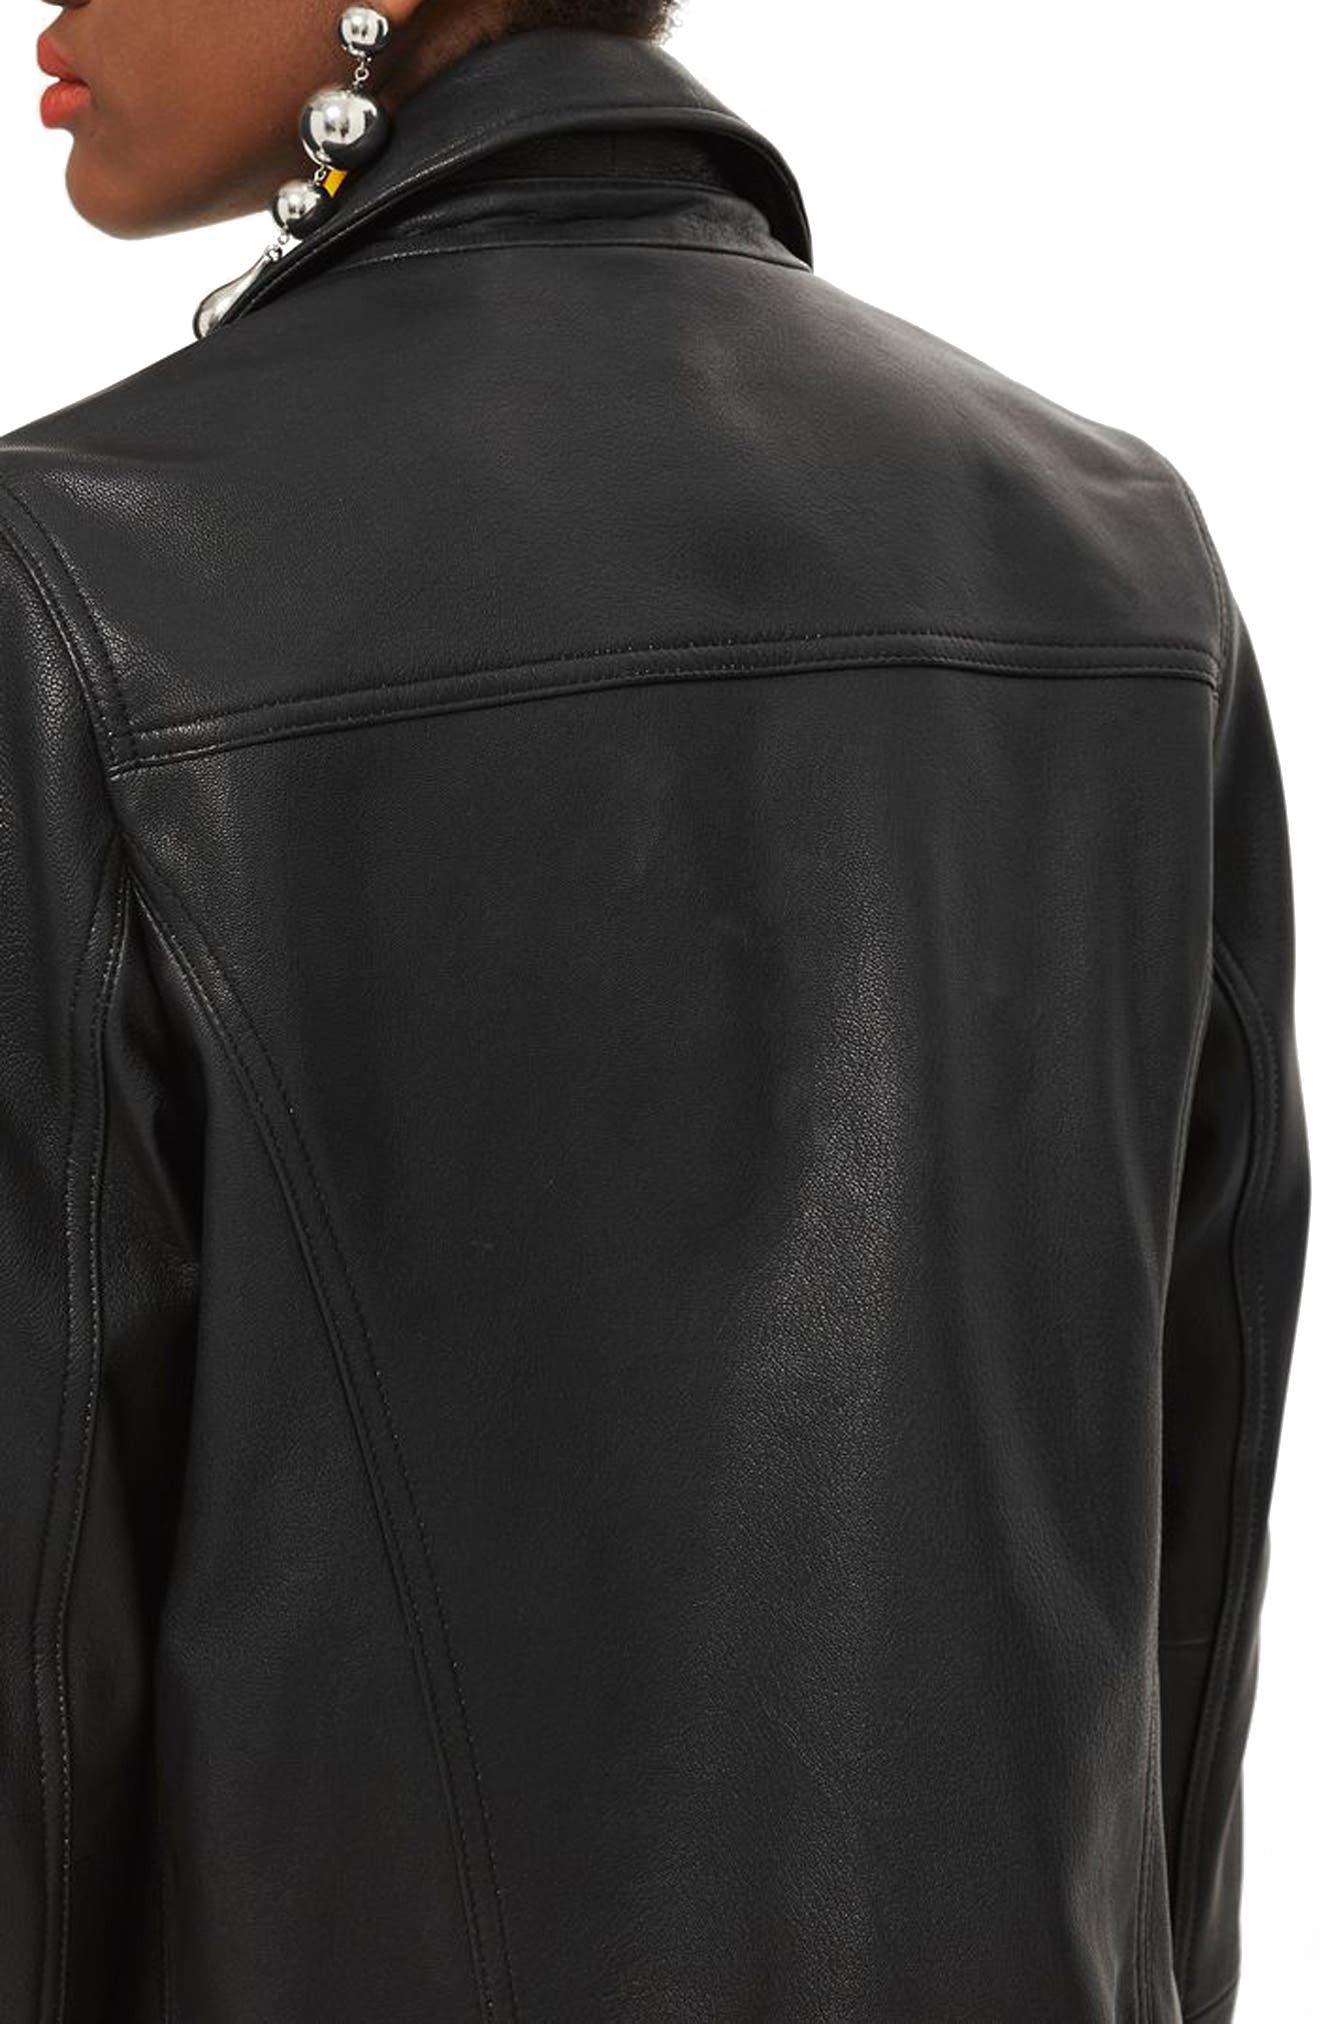 TOPSHOP, Dolly Leather Biker Jacket, Alternate thumbnail 2, color, BLACK